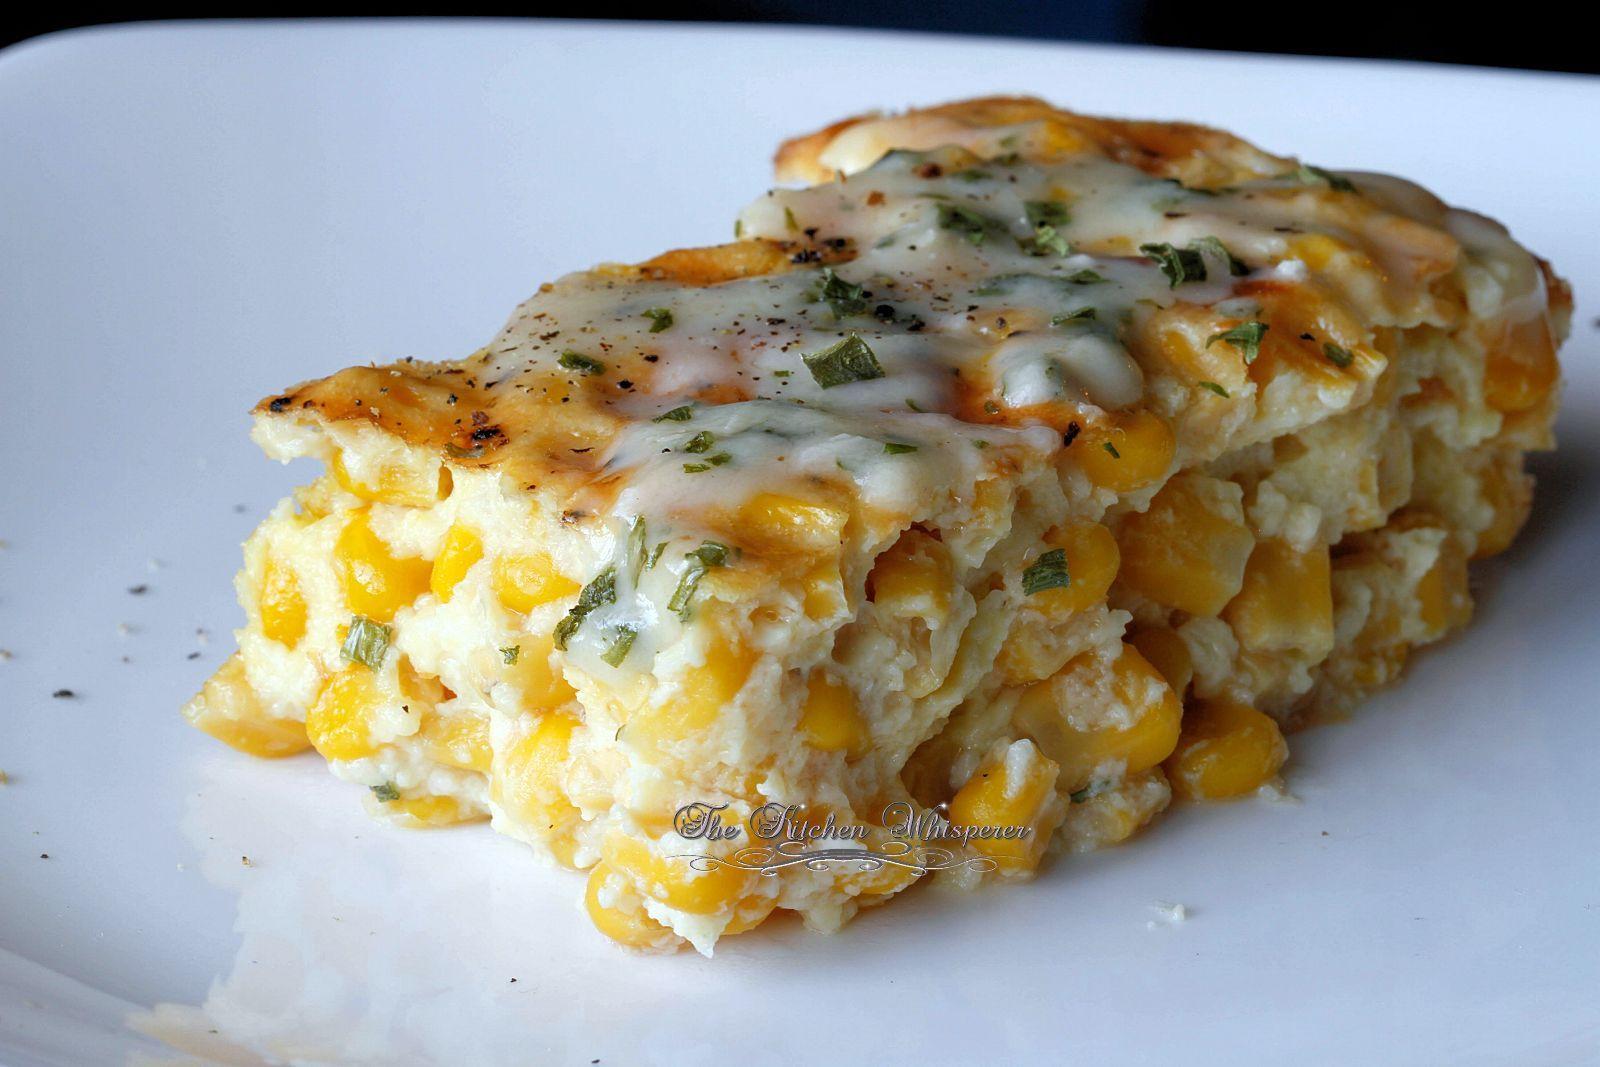 Corn Casserole With Cream Cheese  Baked Creamy Corn Casserole